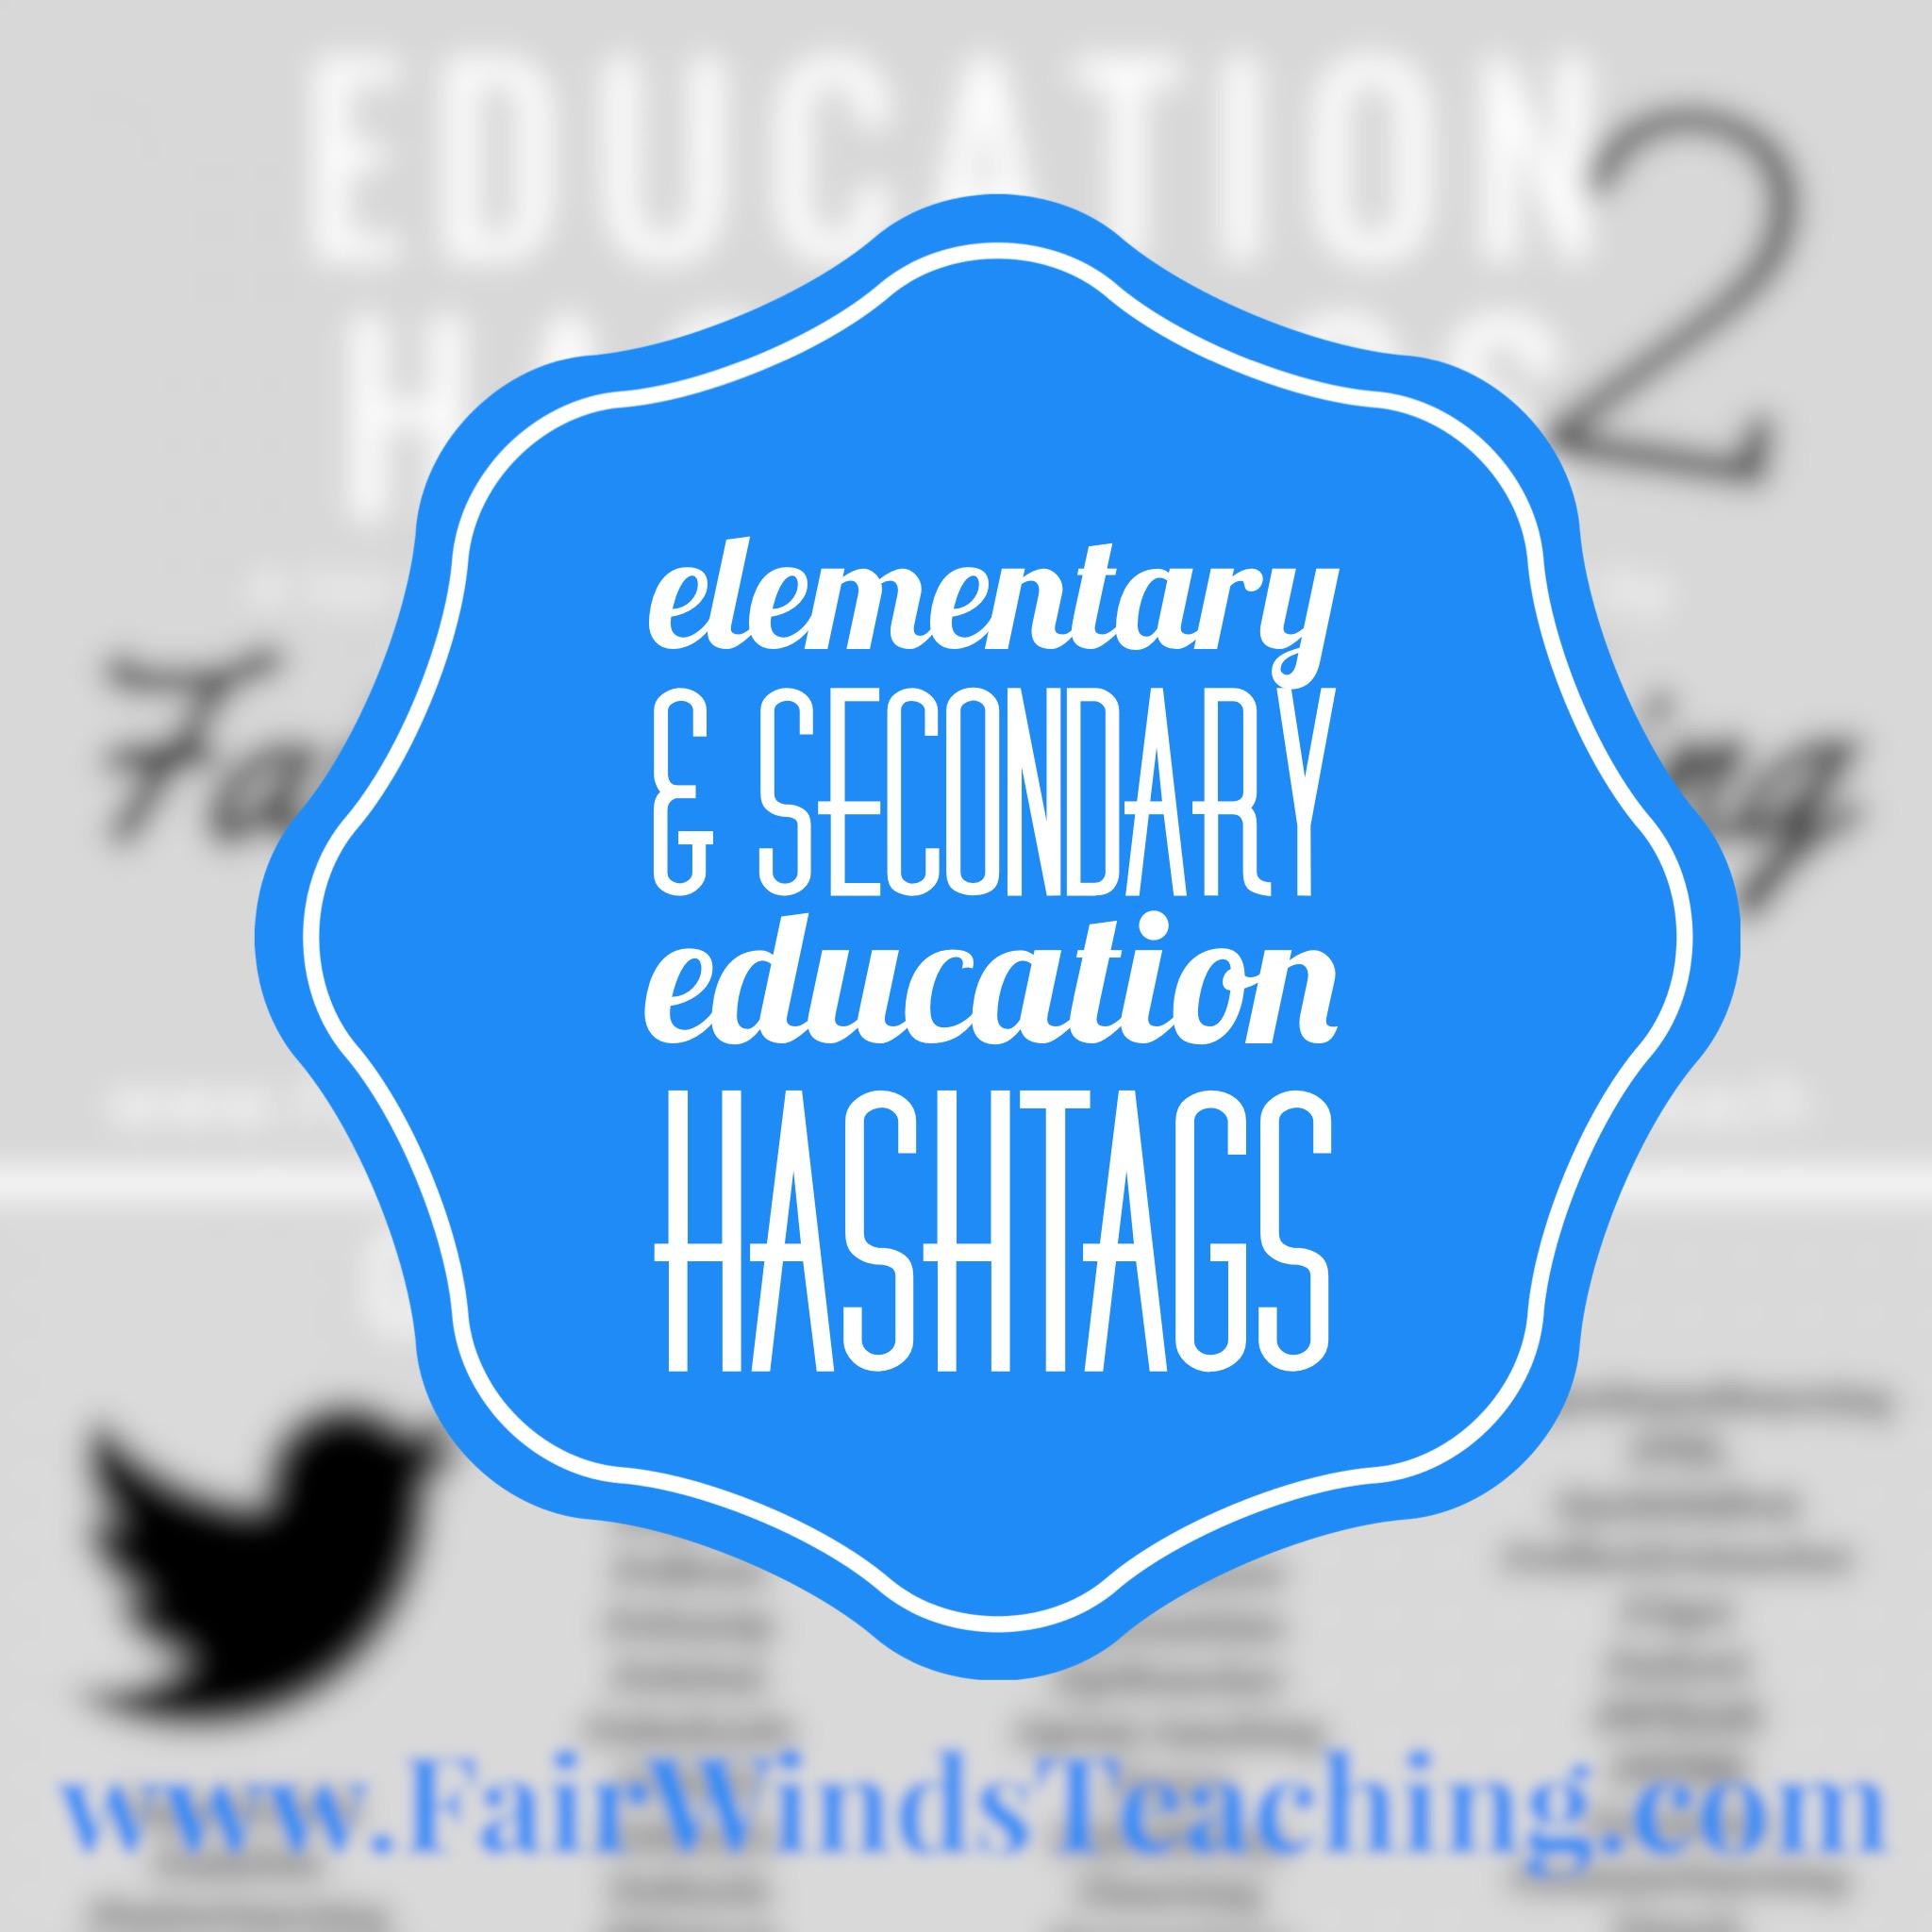 Education Hashtags – Elementary & Secondary